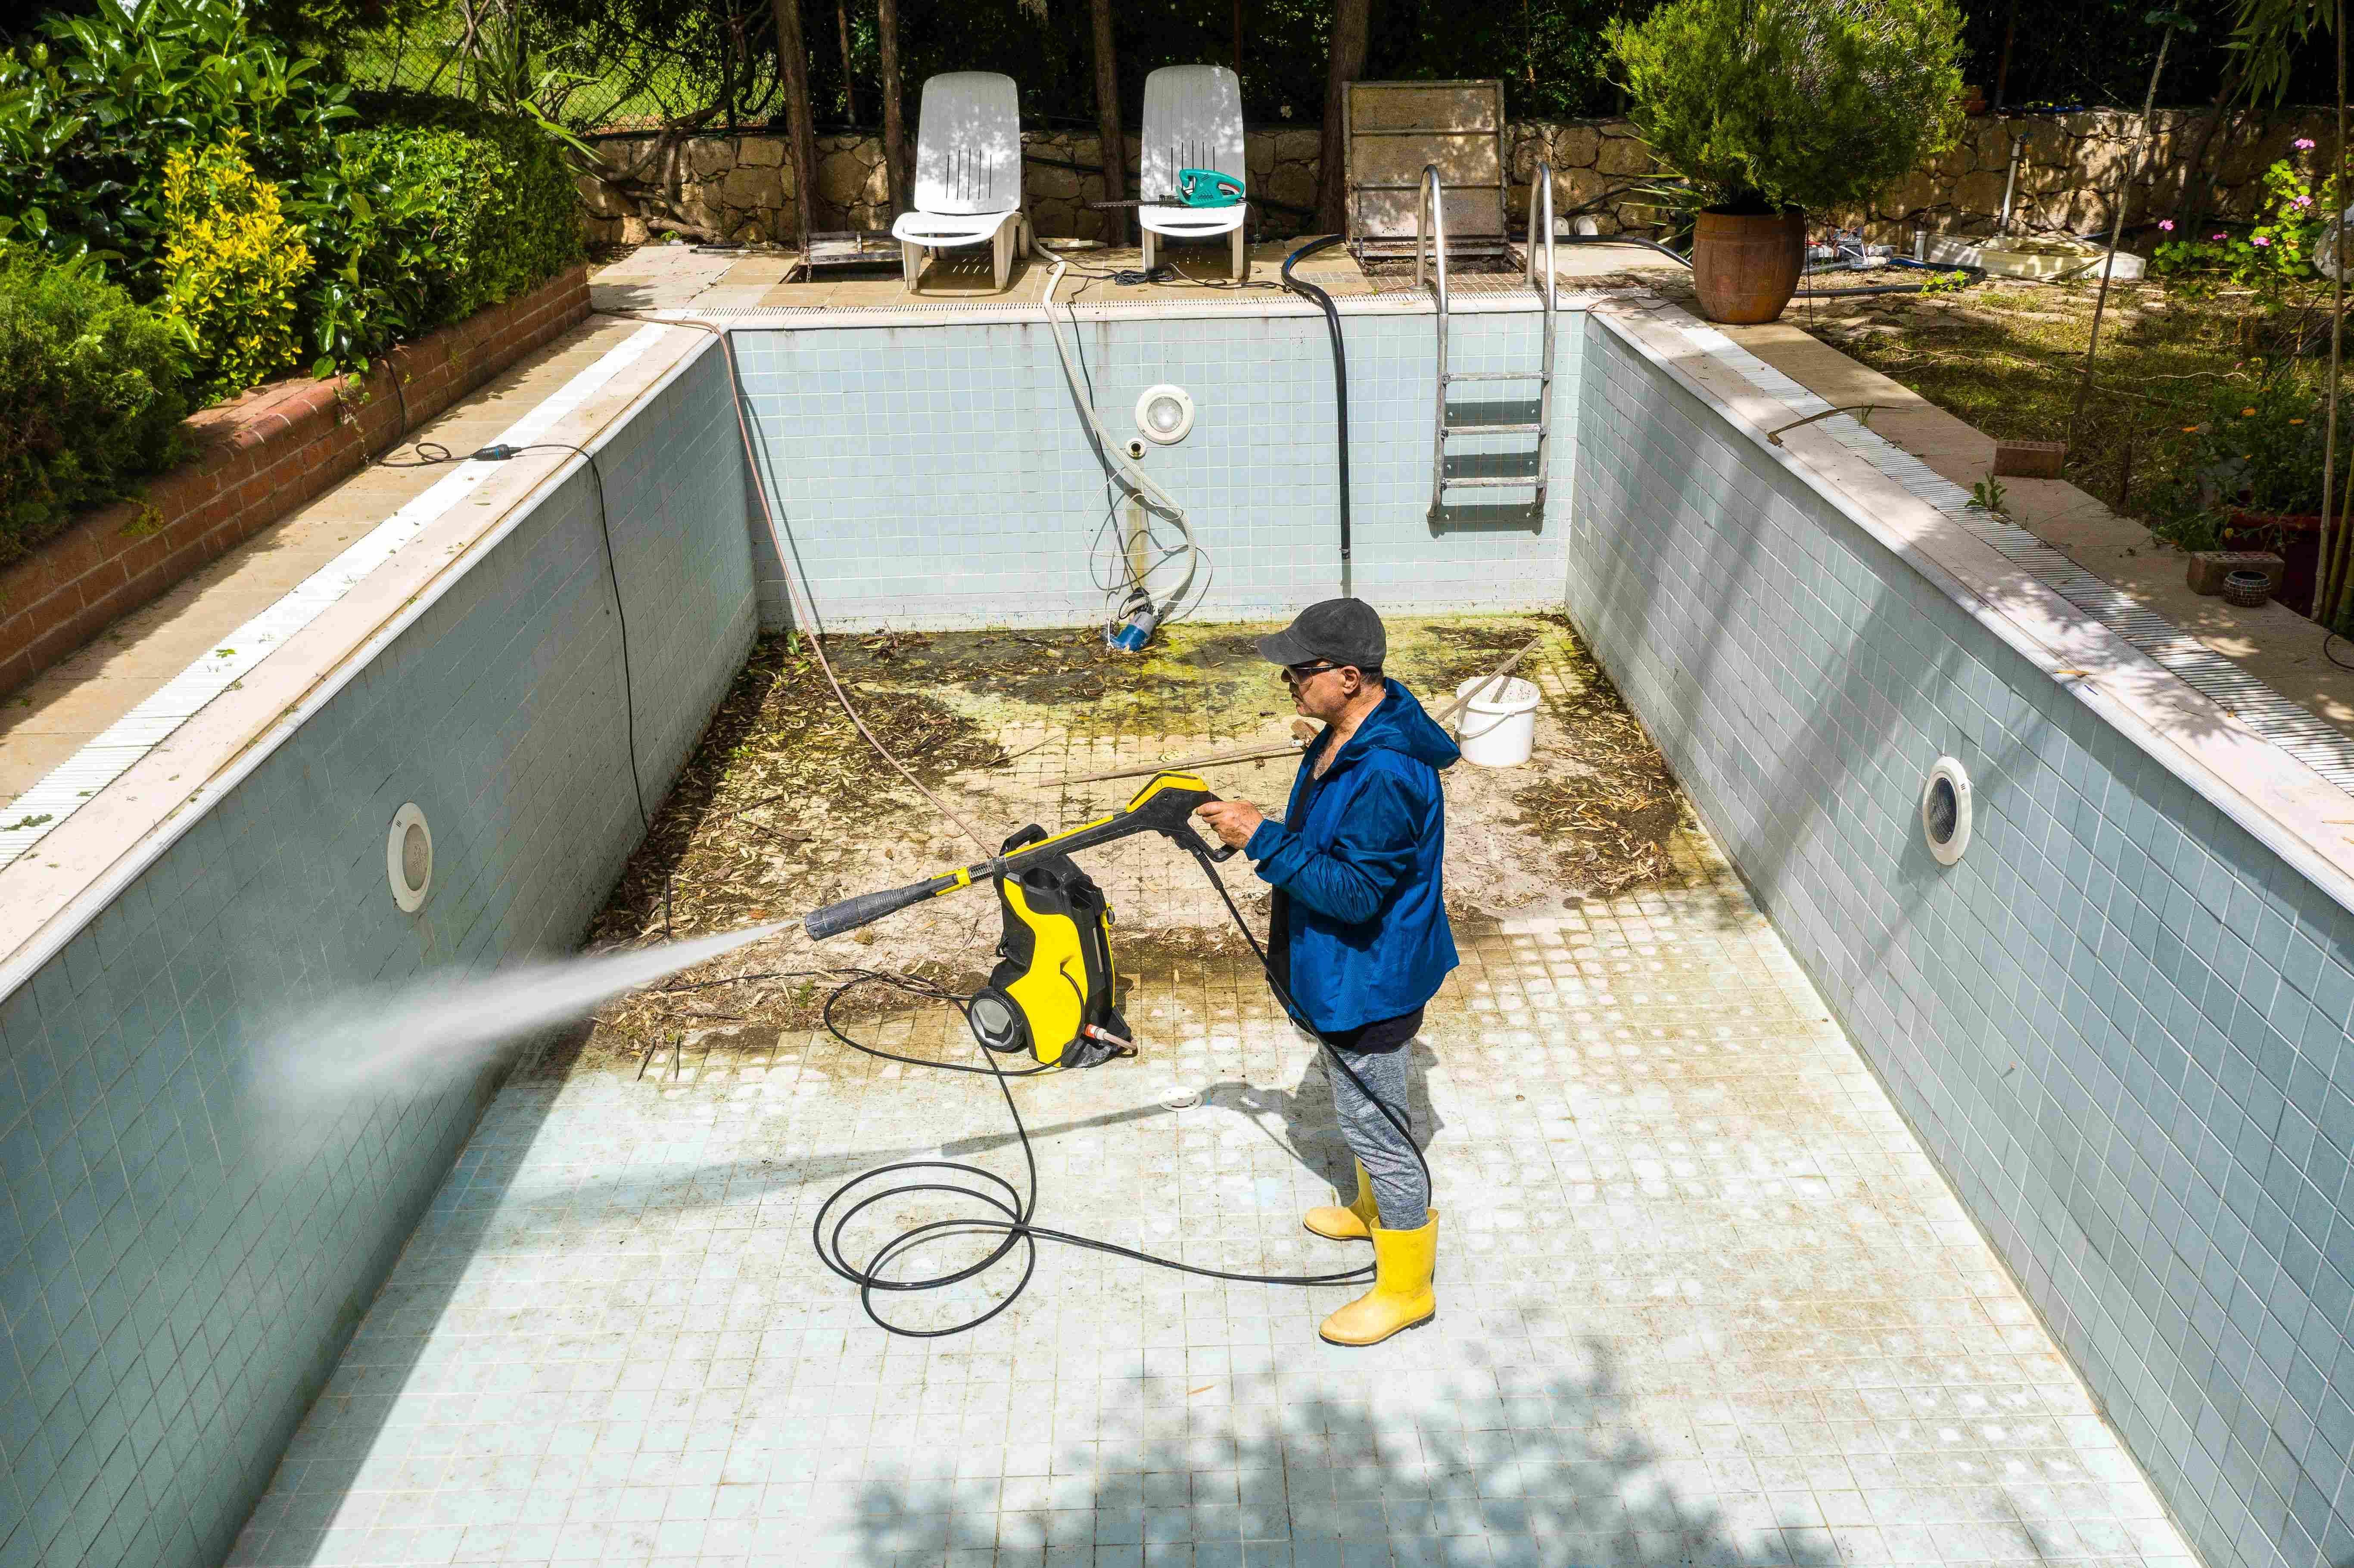 Nettoyer une piscine  avec un nettoyeur haute pression